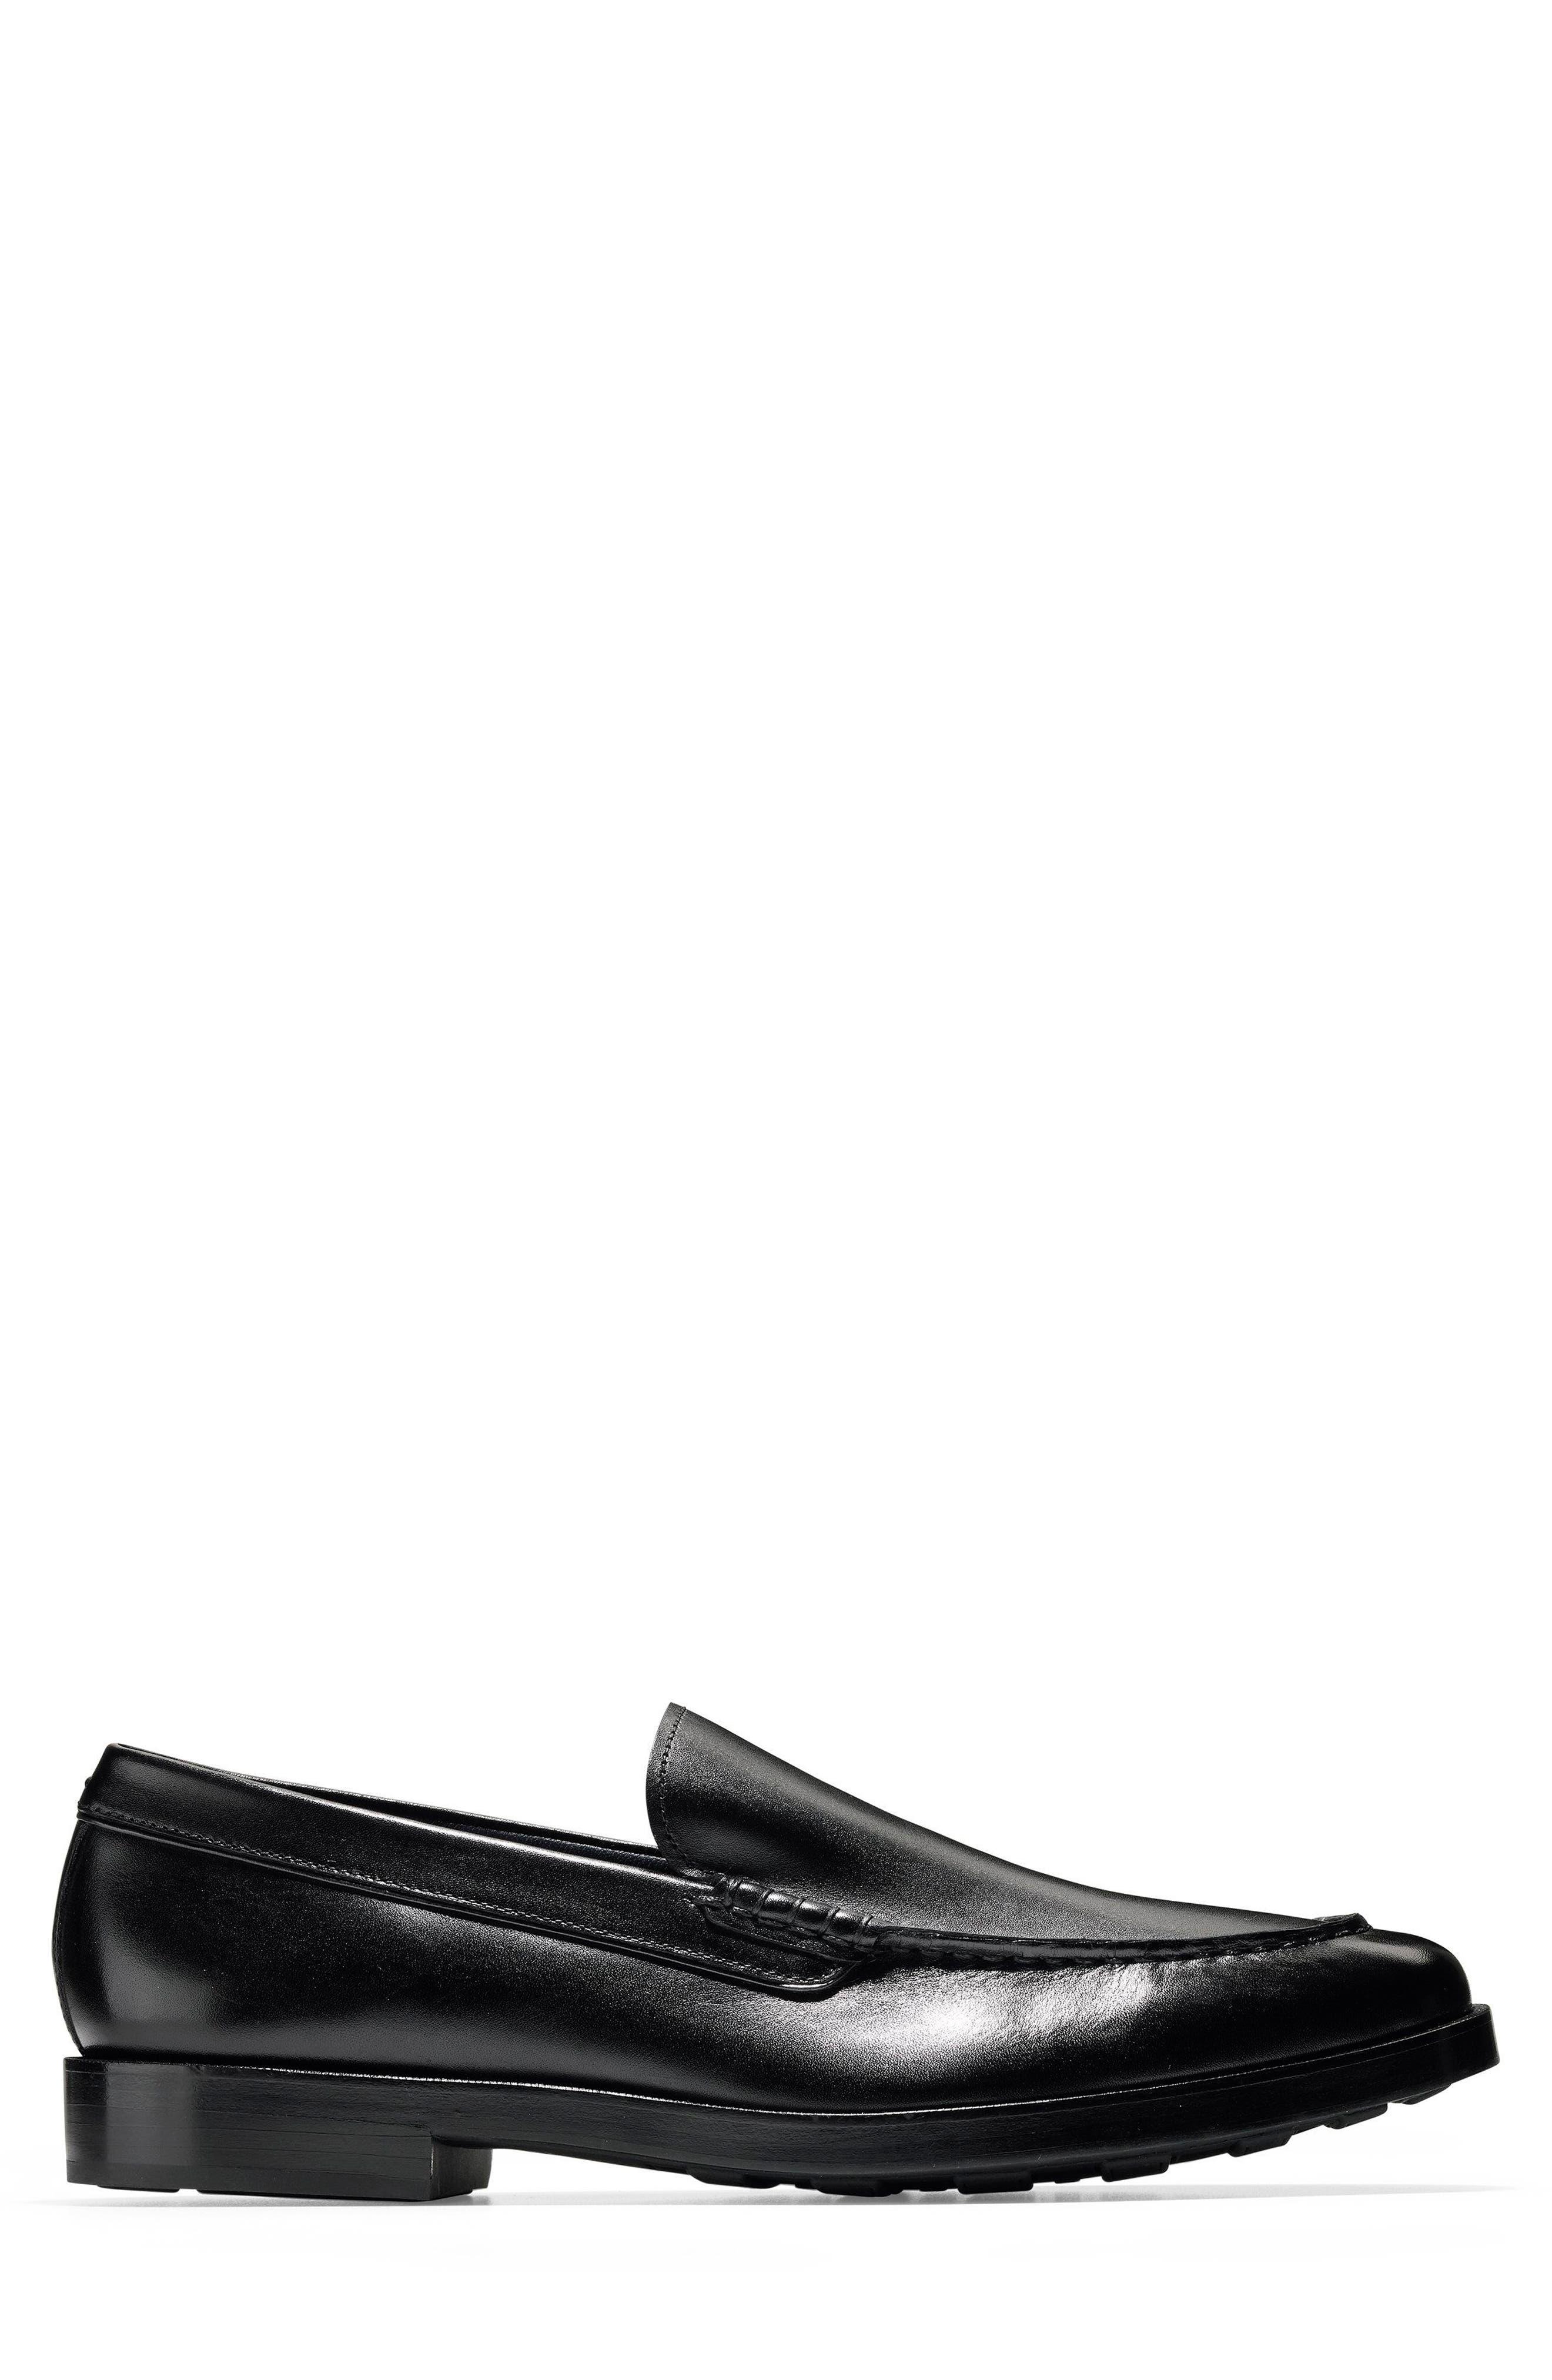 Hamilton Grand Venetian Loafer,                             Alternate thumbnail 3, color,                             BLACK